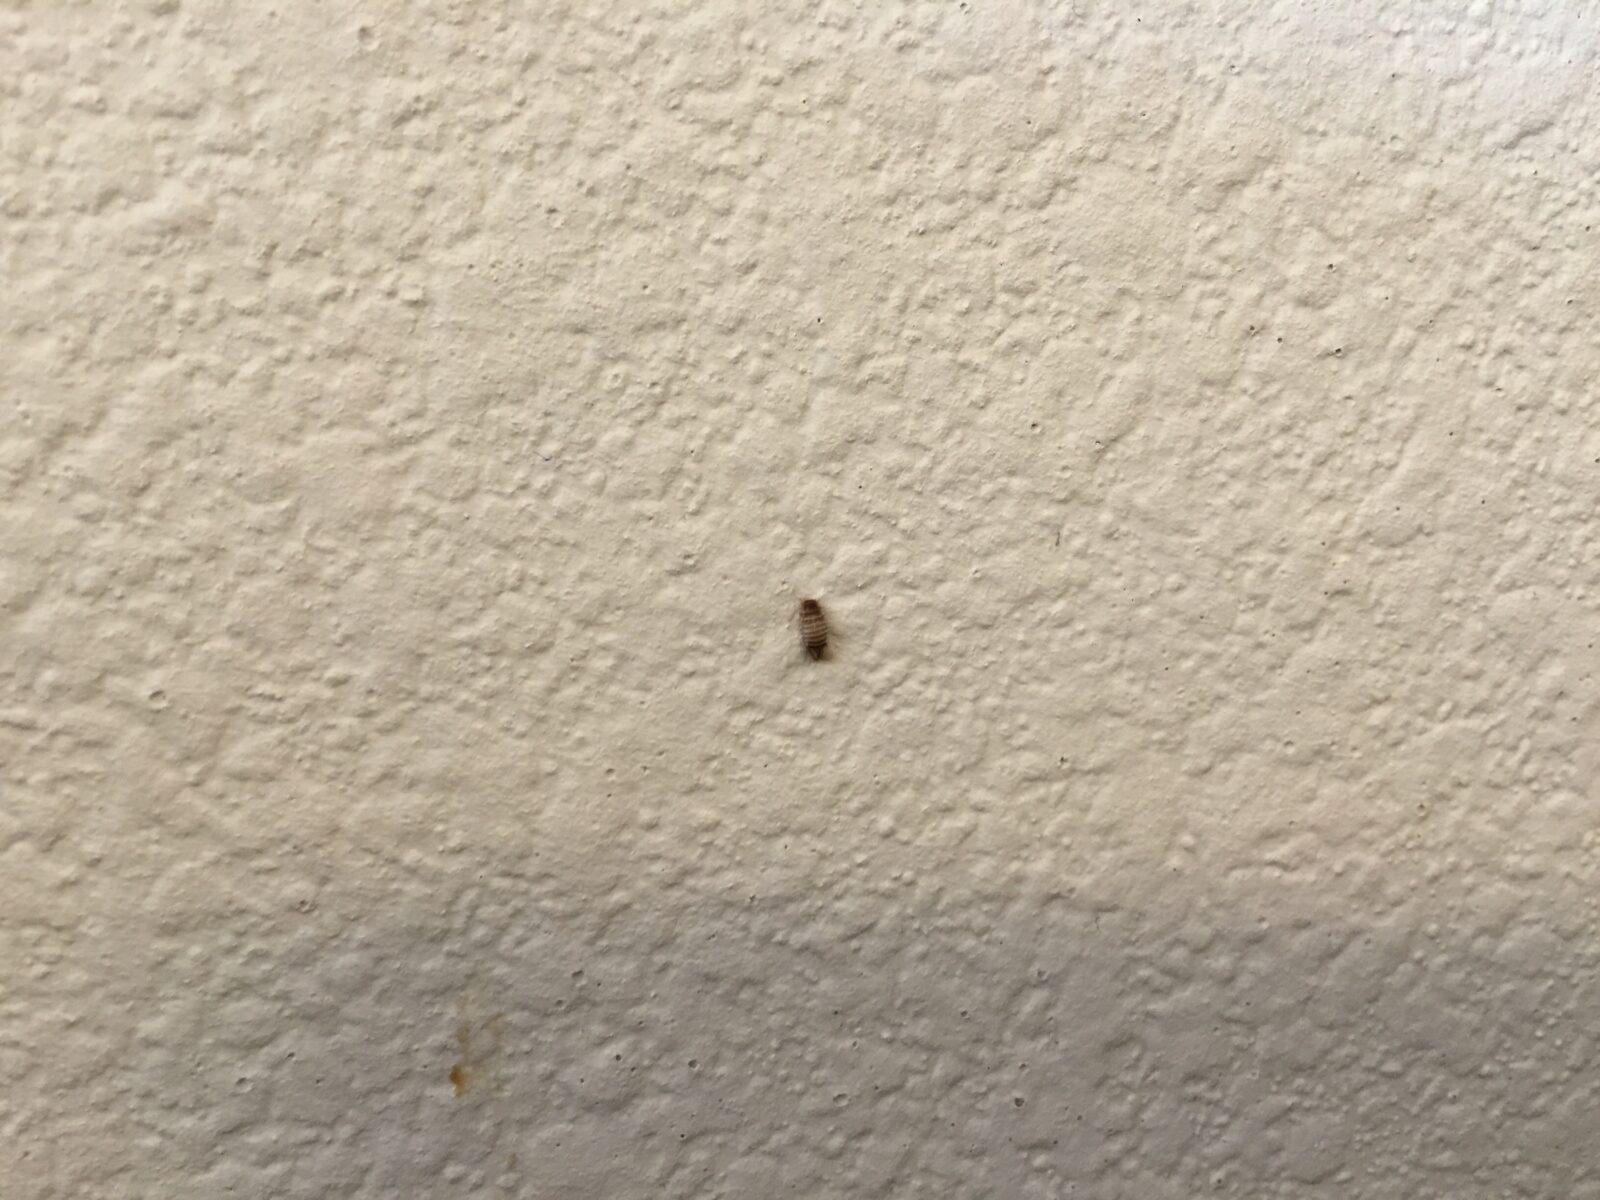 Carpet Beetle Infestation In Walls